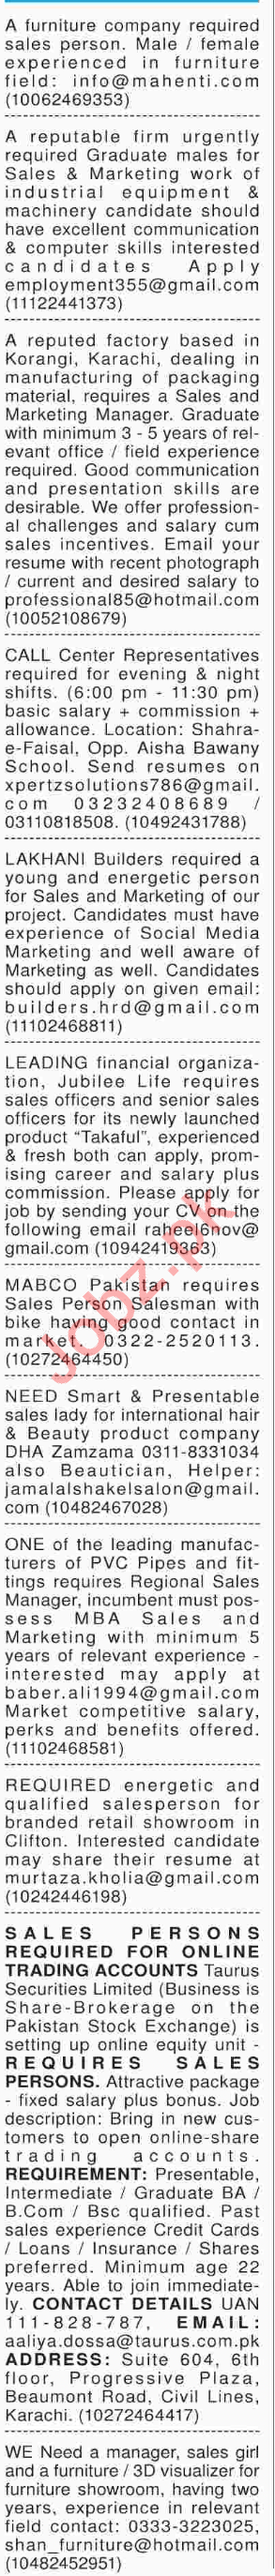 Receptionist & Tele Operator Jobs in Karachi